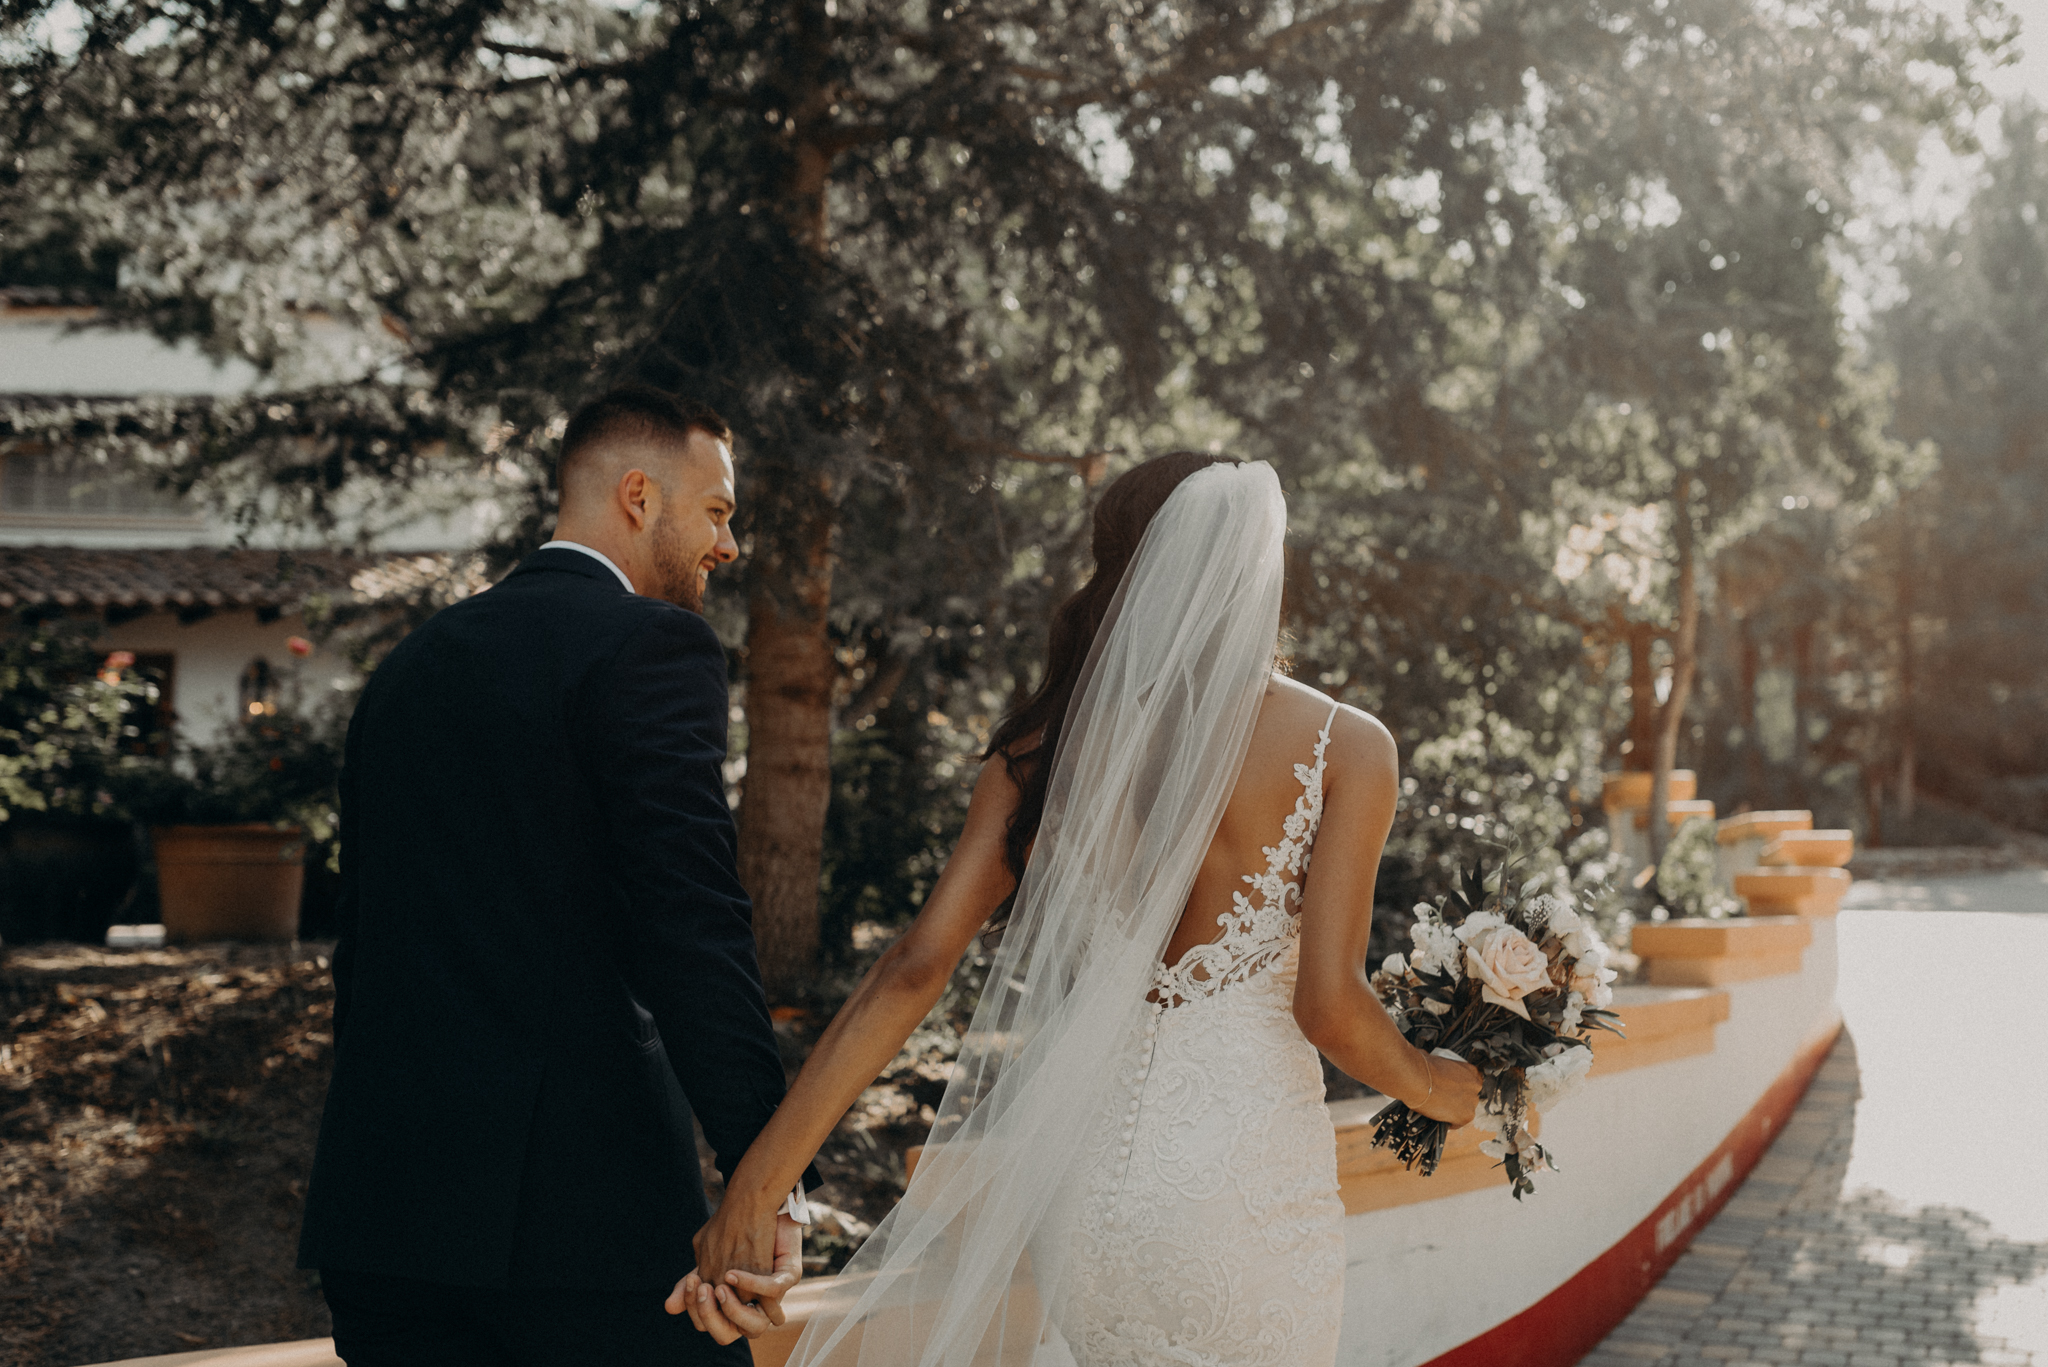 Isaiah + Taylor Photography - Rancho Las Lomas Wedding, Los Angeles Wedding Photographer-081.jpg